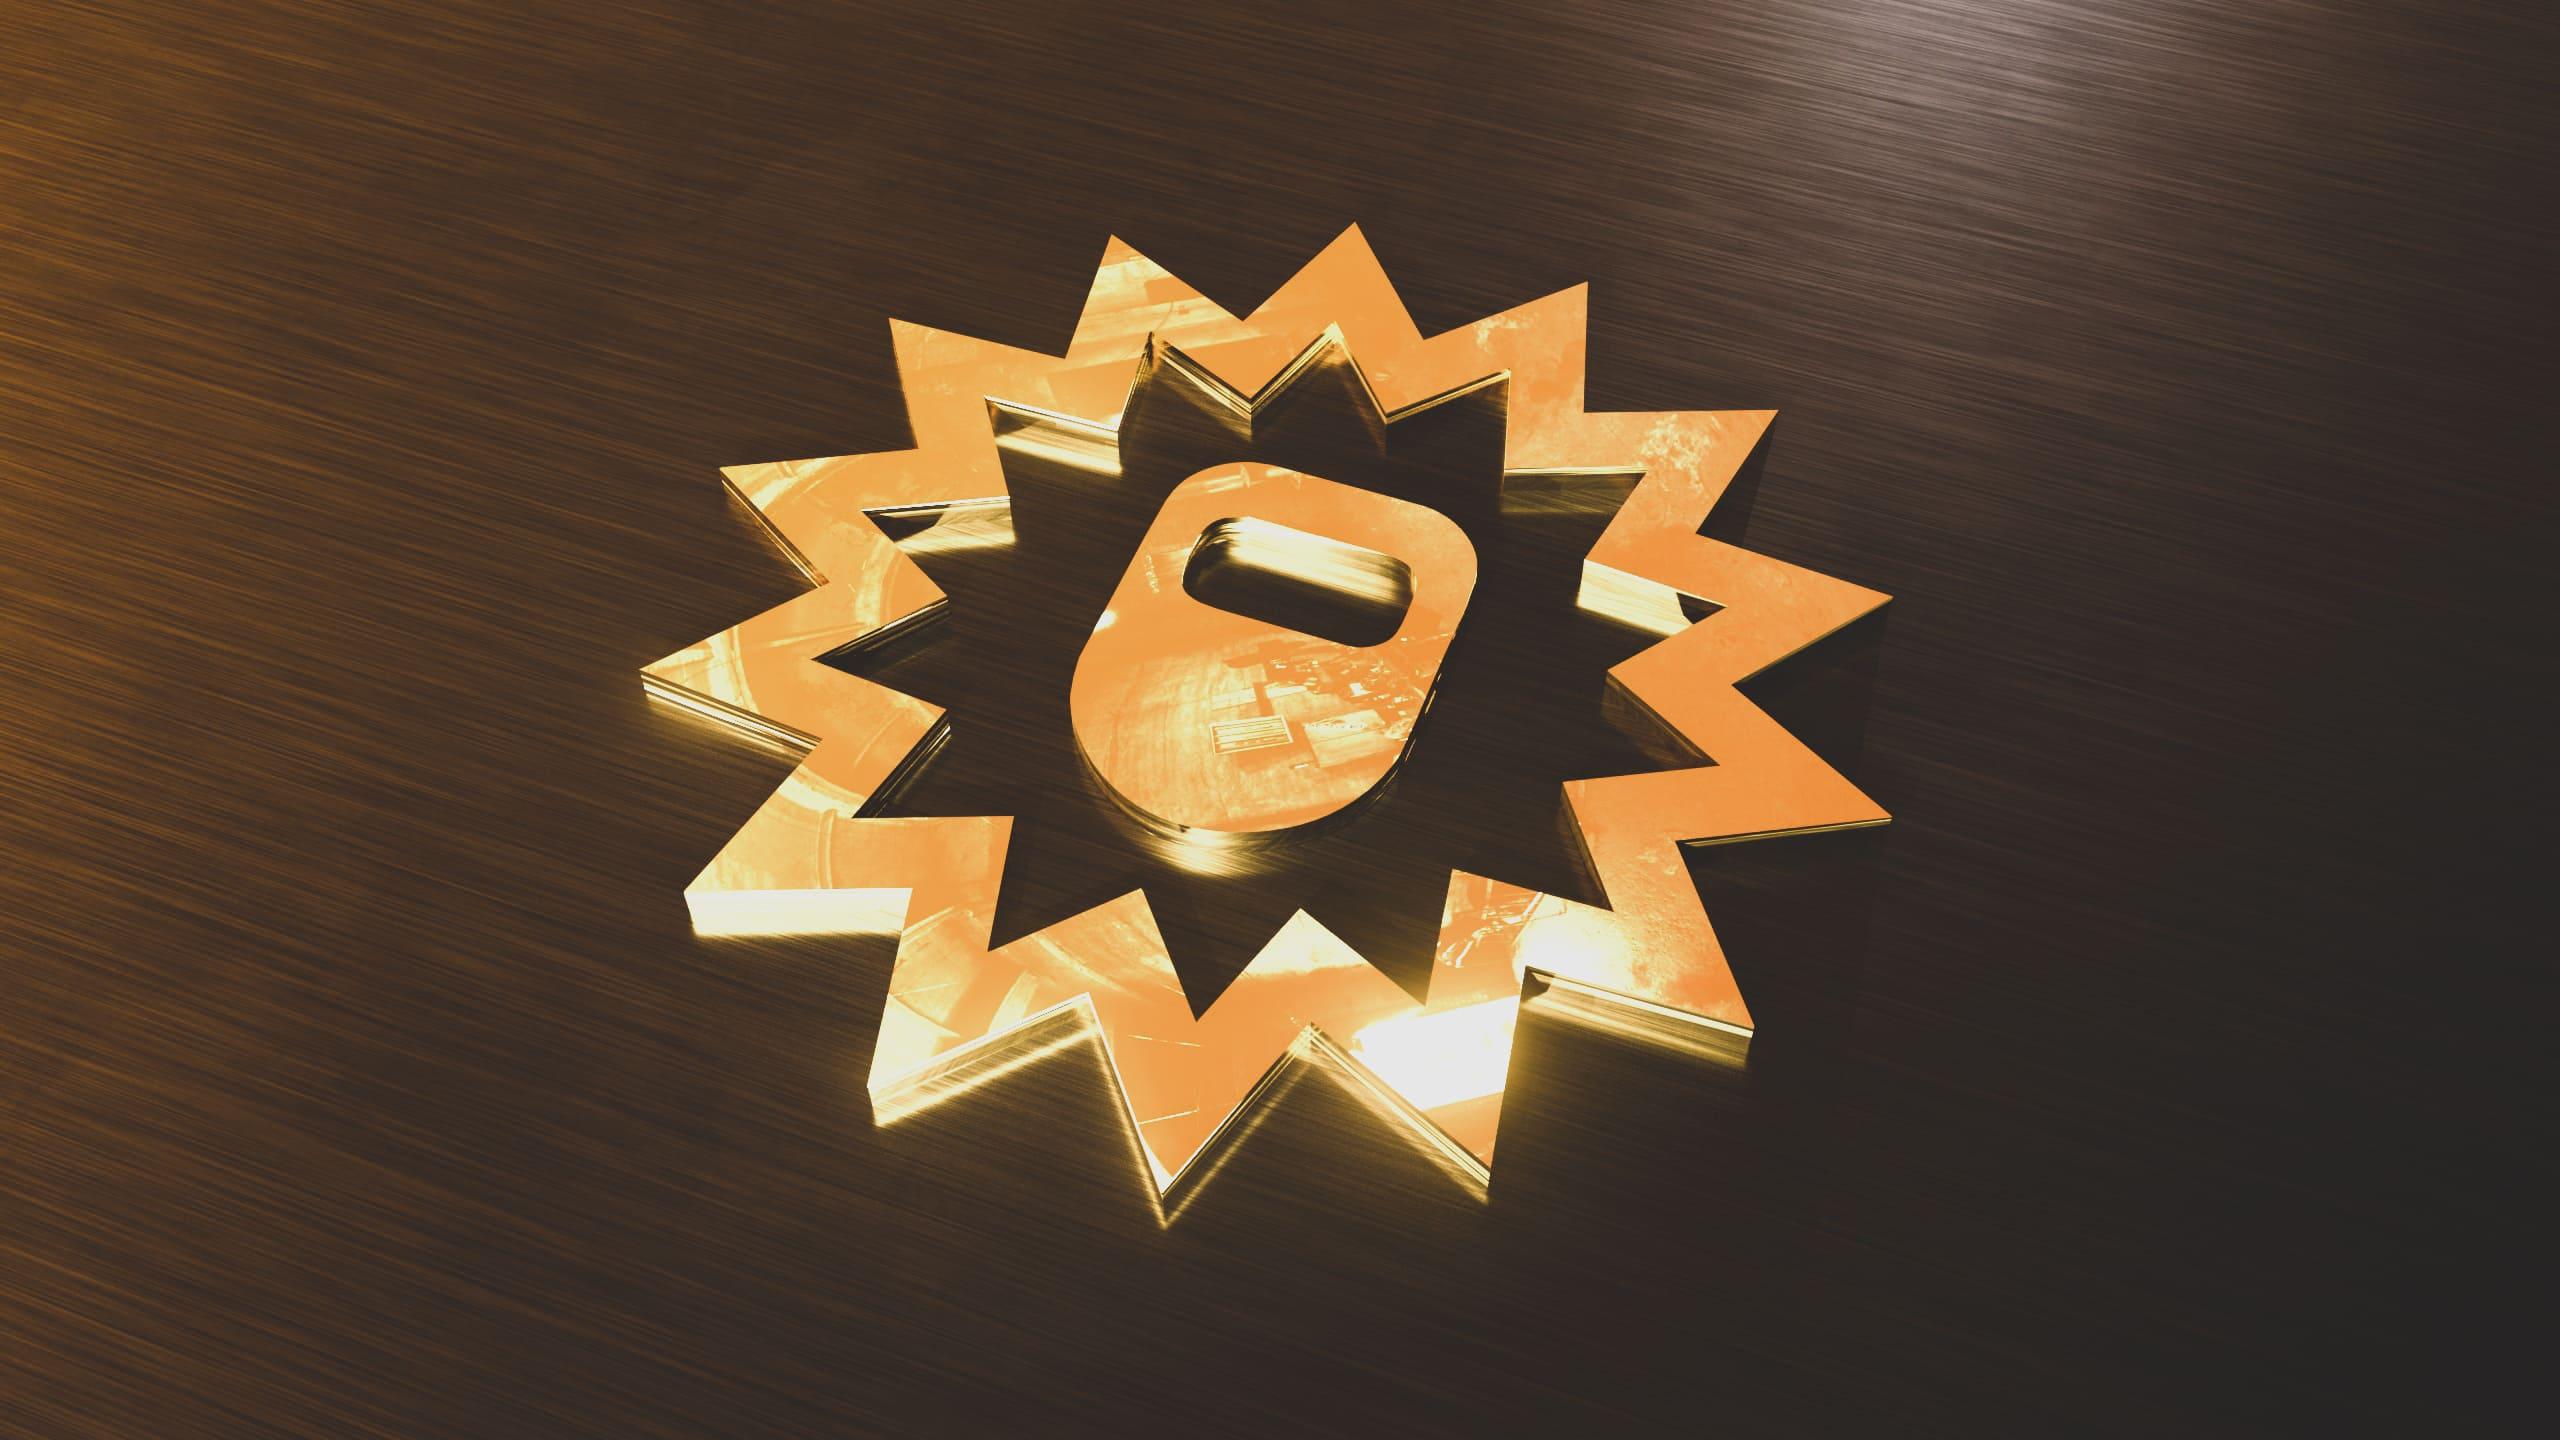 Разработка логотипа для Конкурса фото f_3535f6d18bfdc68f.jpg